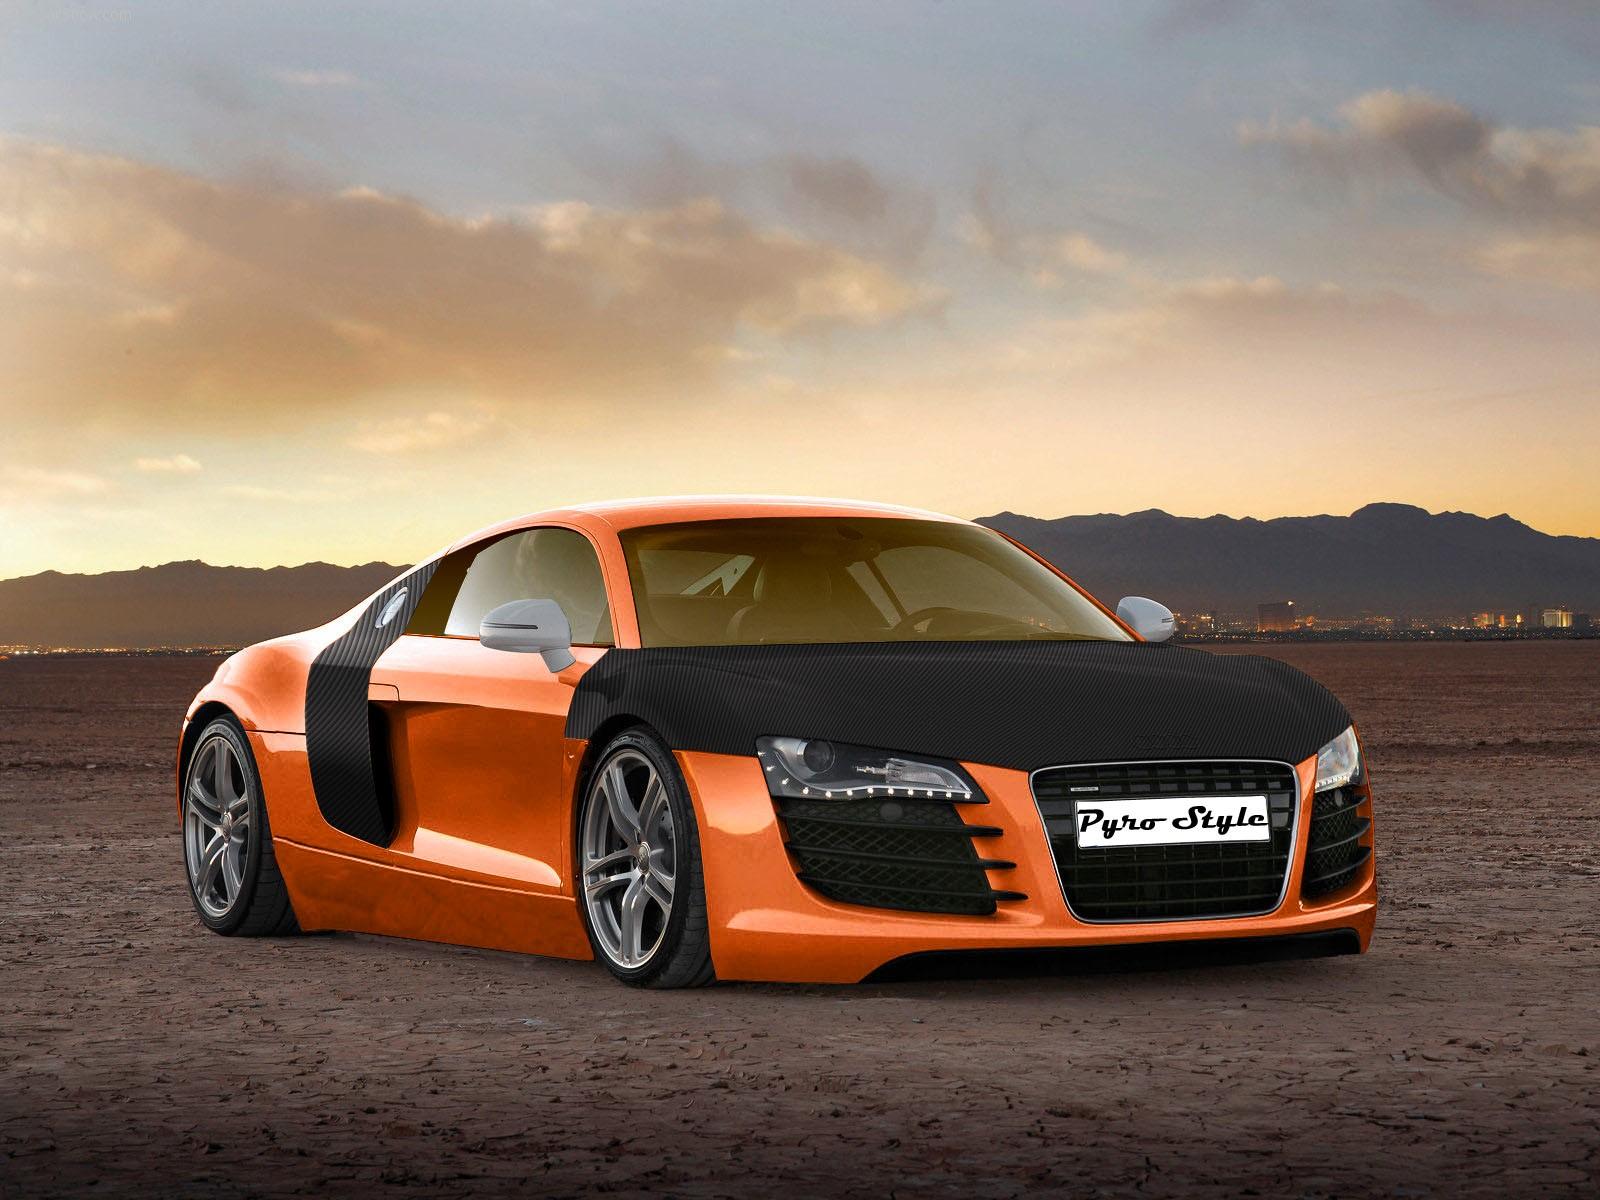 Audi r8 hd masast araba resimleri   Audi r8 HD Desktop Wallpapers 1600x1200